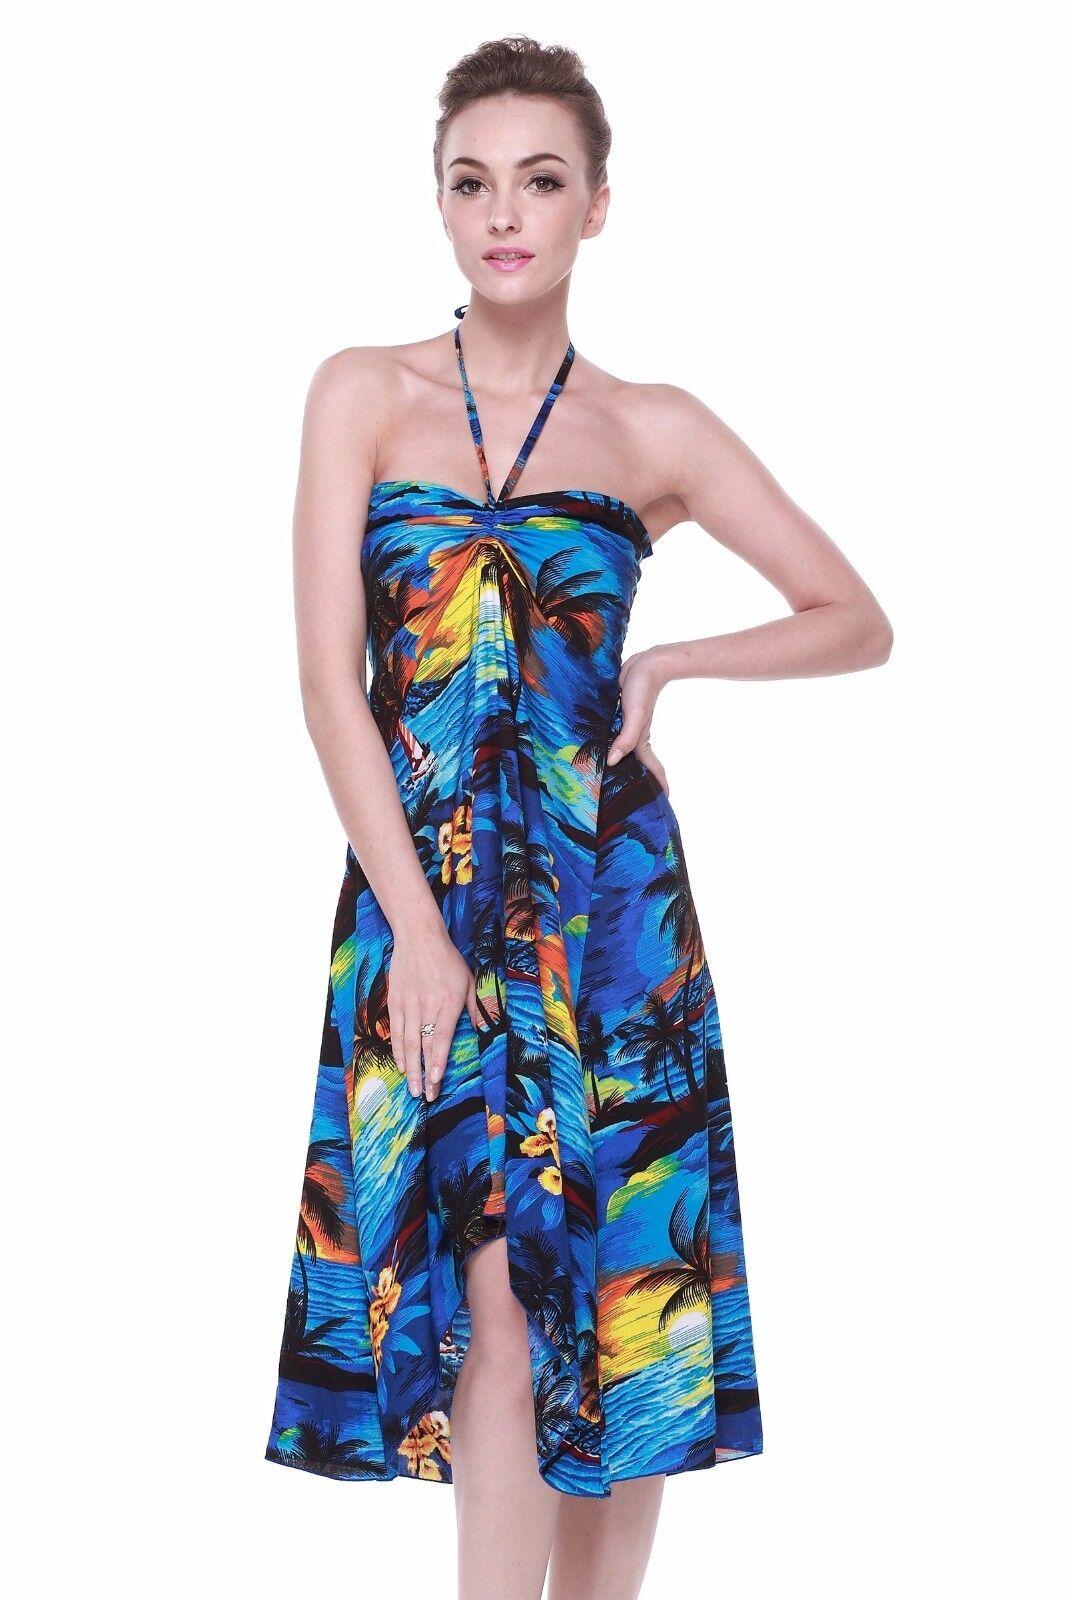 Hawaii Hangover Hawaiian Butterfly Dress Luau Cruise in Sunset Blue ...